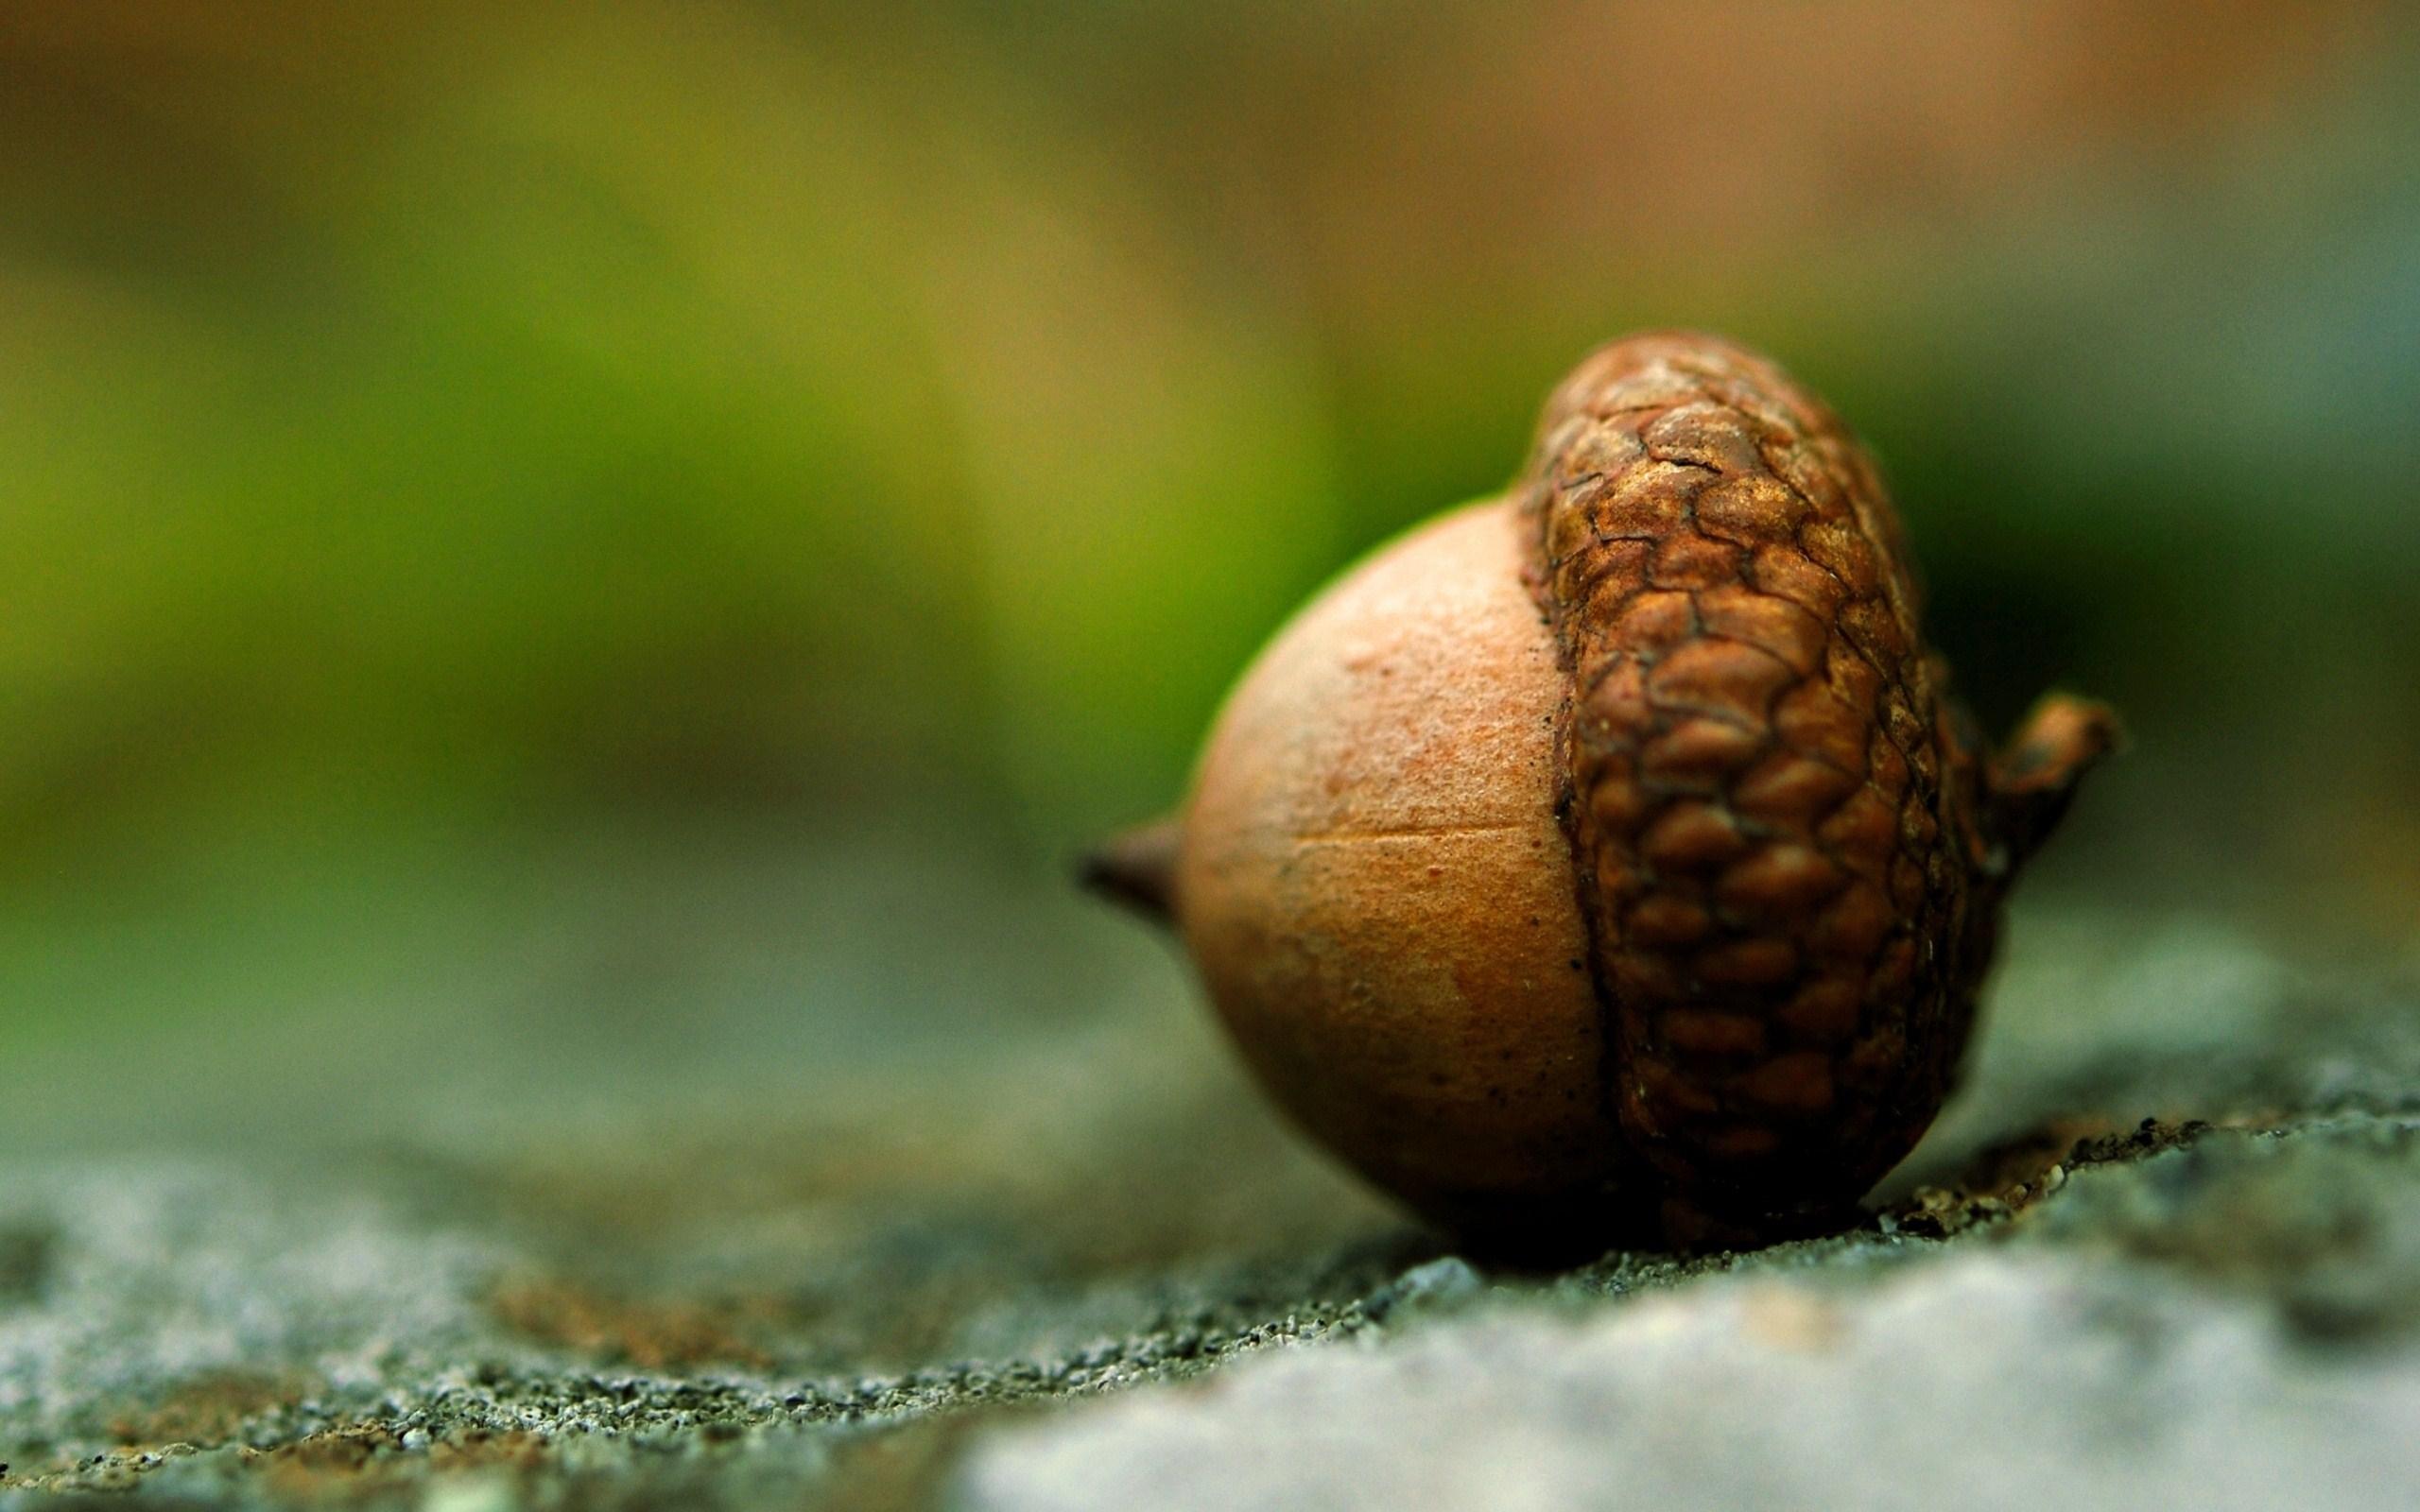 acorn wallpaper 23360